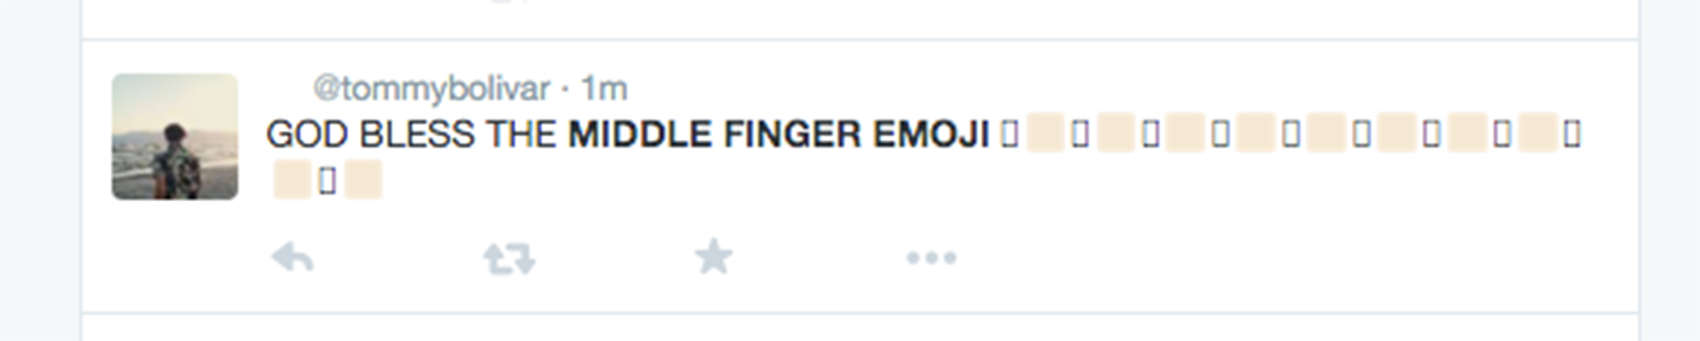 Twitter flips out over Apple's new bird-flipping emoji